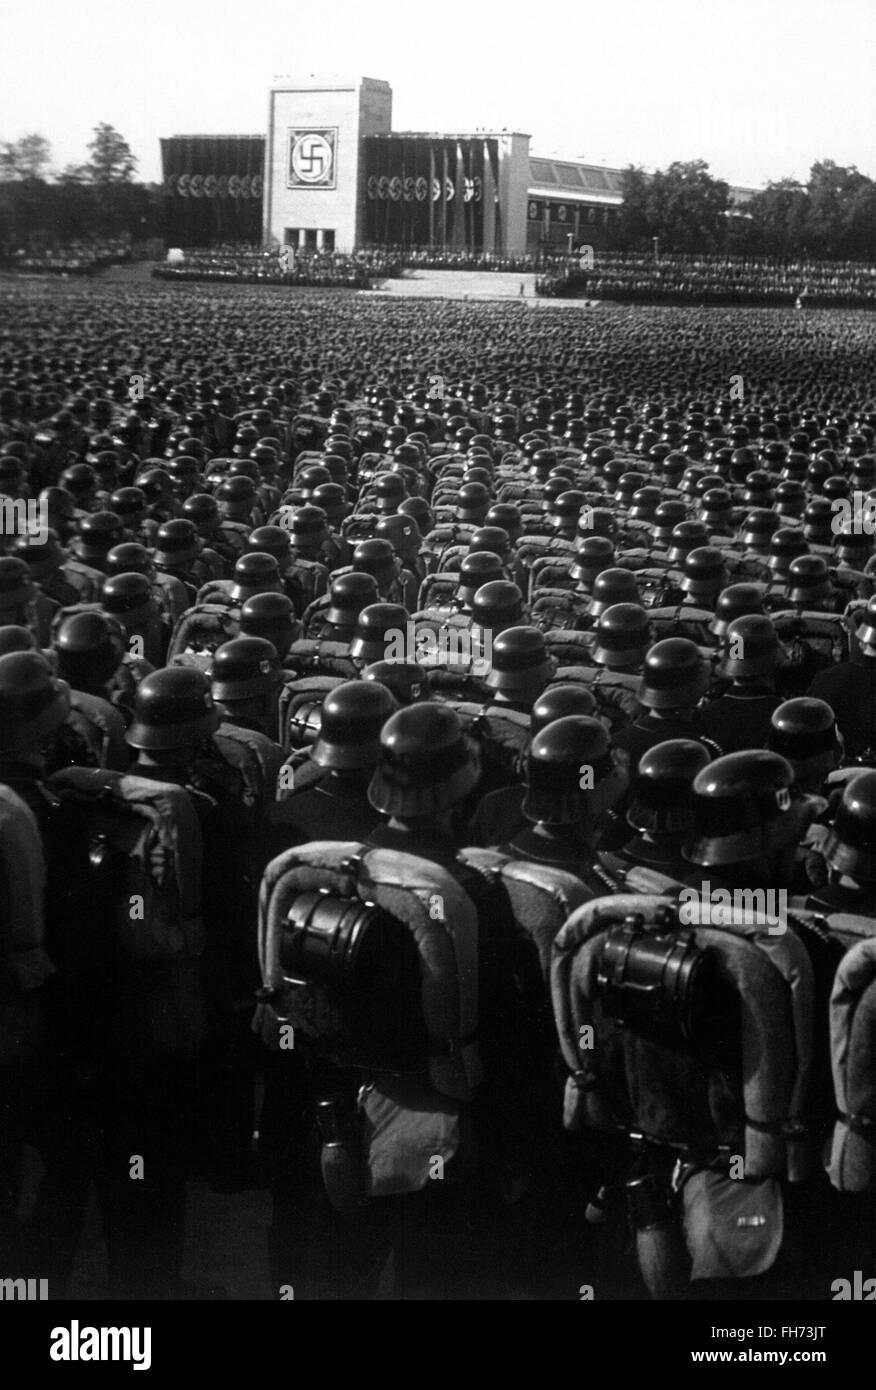 Reichsparteitag 1935 - German Nazi Propaganda Photography - WWII - Stock Image